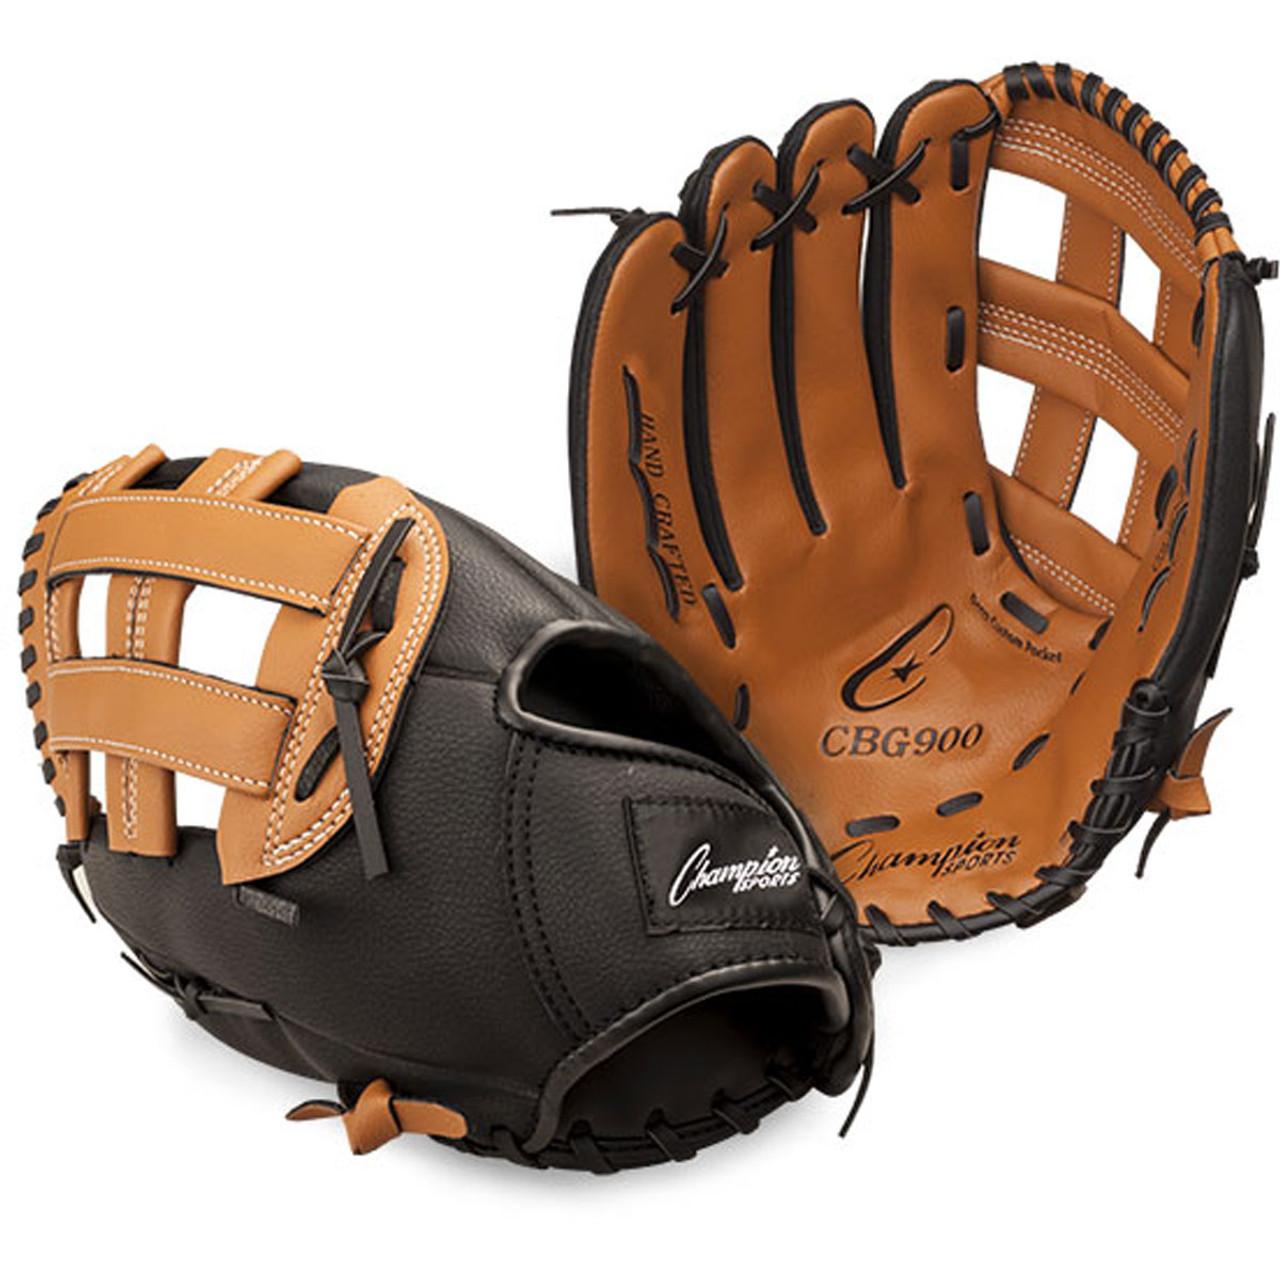 Schutt Sports Synthetic Leather Baseball and Softball Uniform Belt